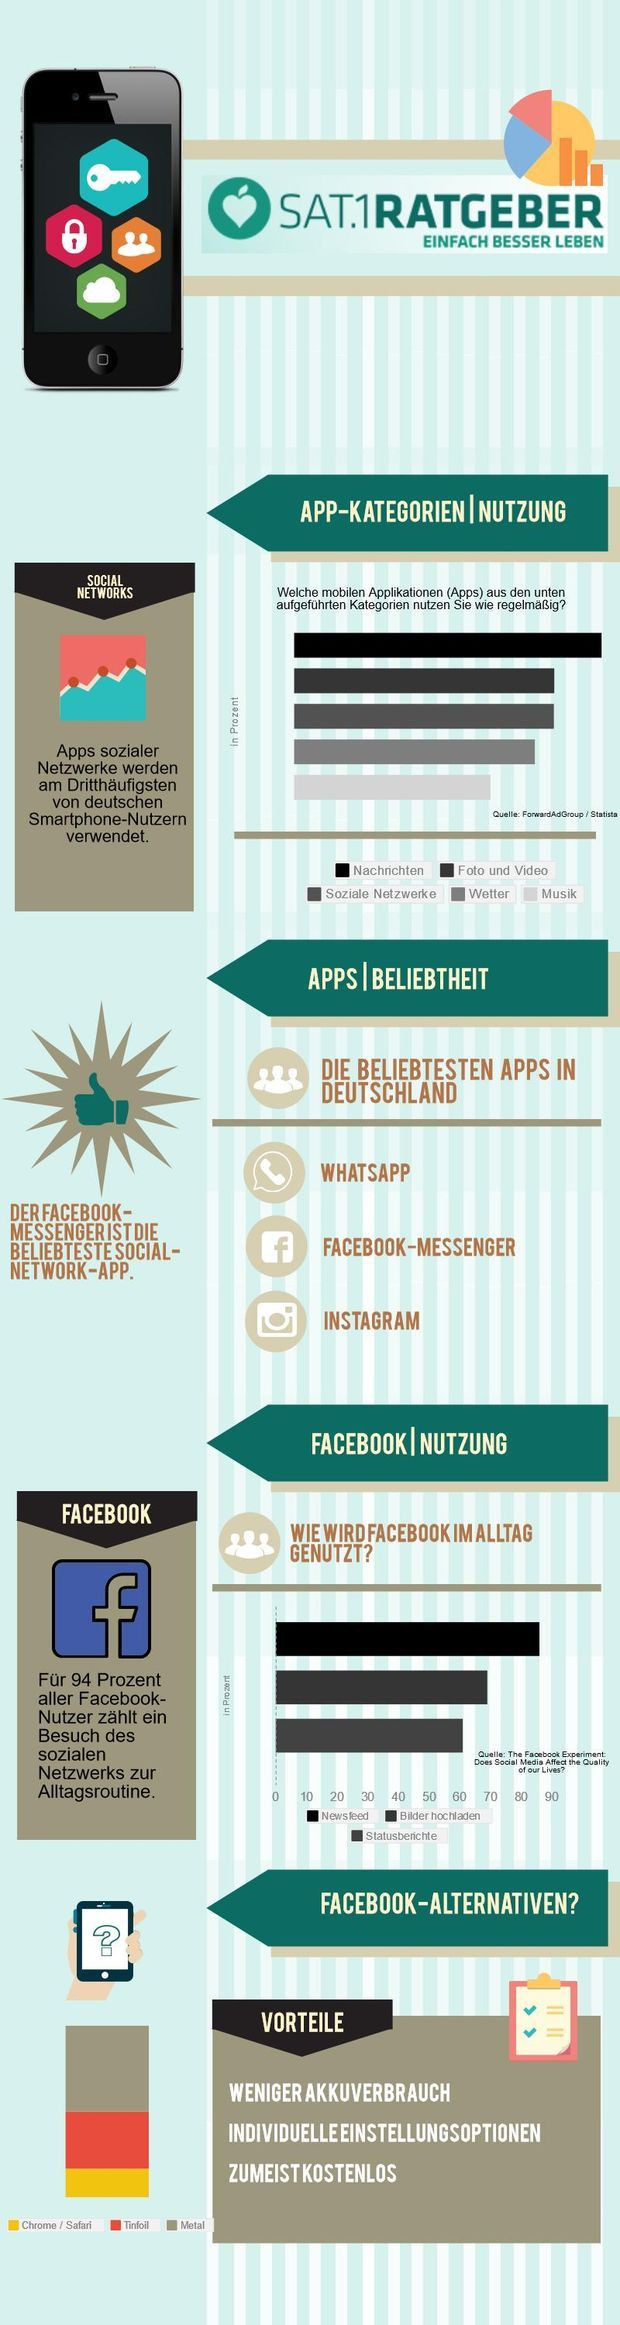 Infografik über Smartphones und Apps